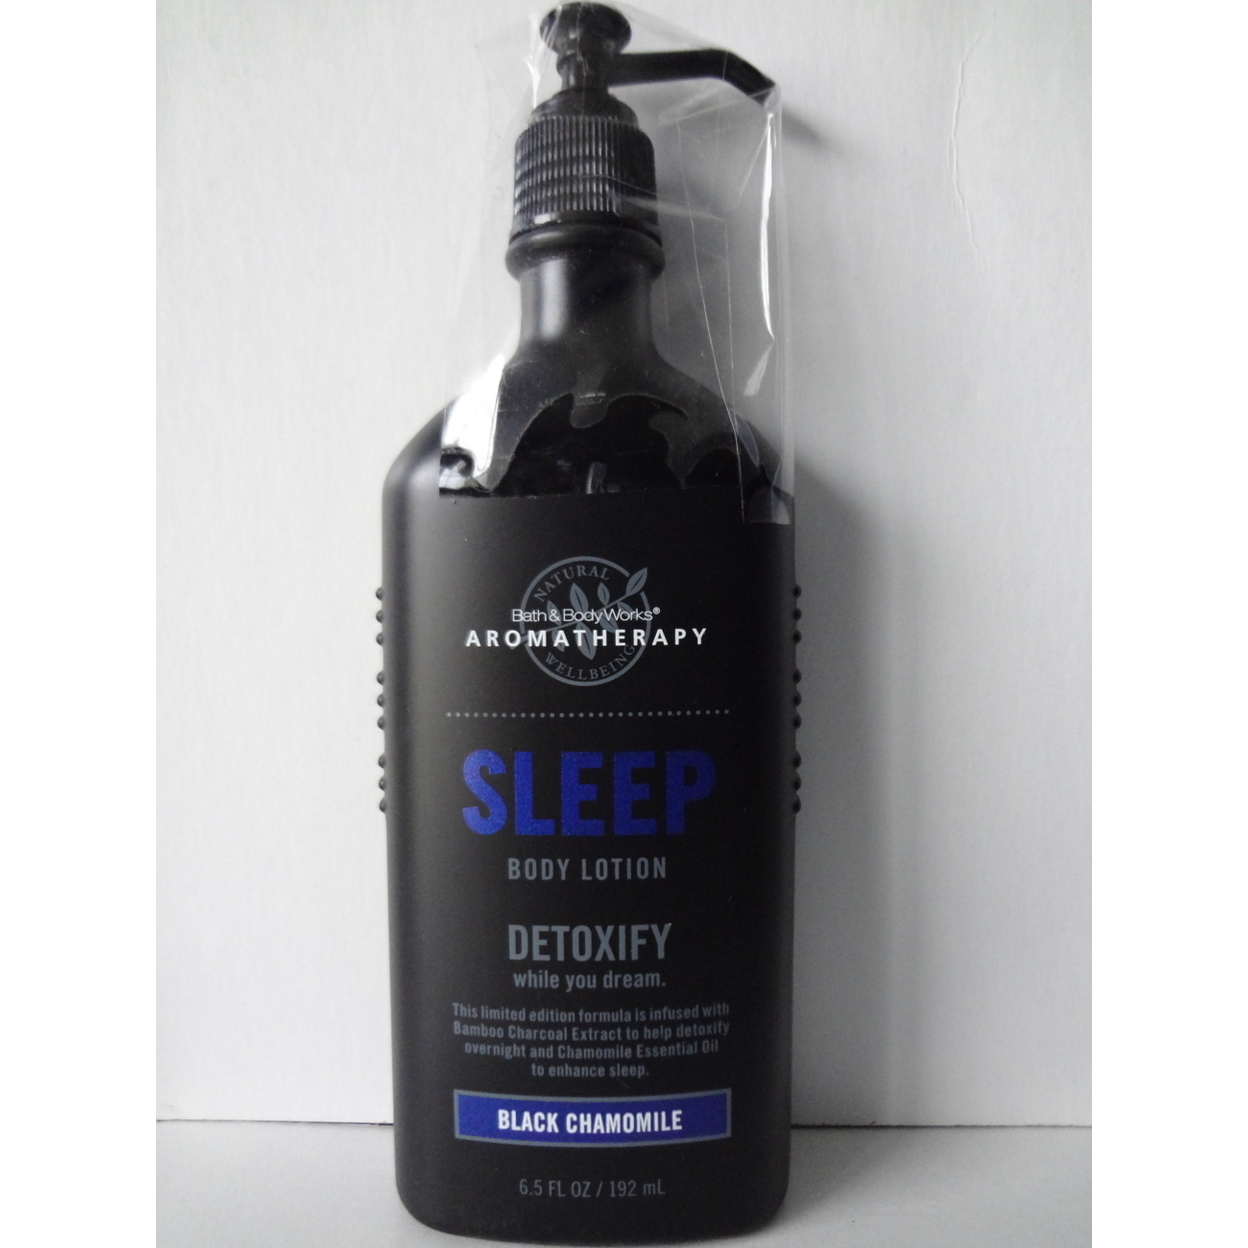 Bath & Body Works Aromatherapy BLACK CHAMOMILE Sleep Body Lotion 6.5 oz / 192 ml